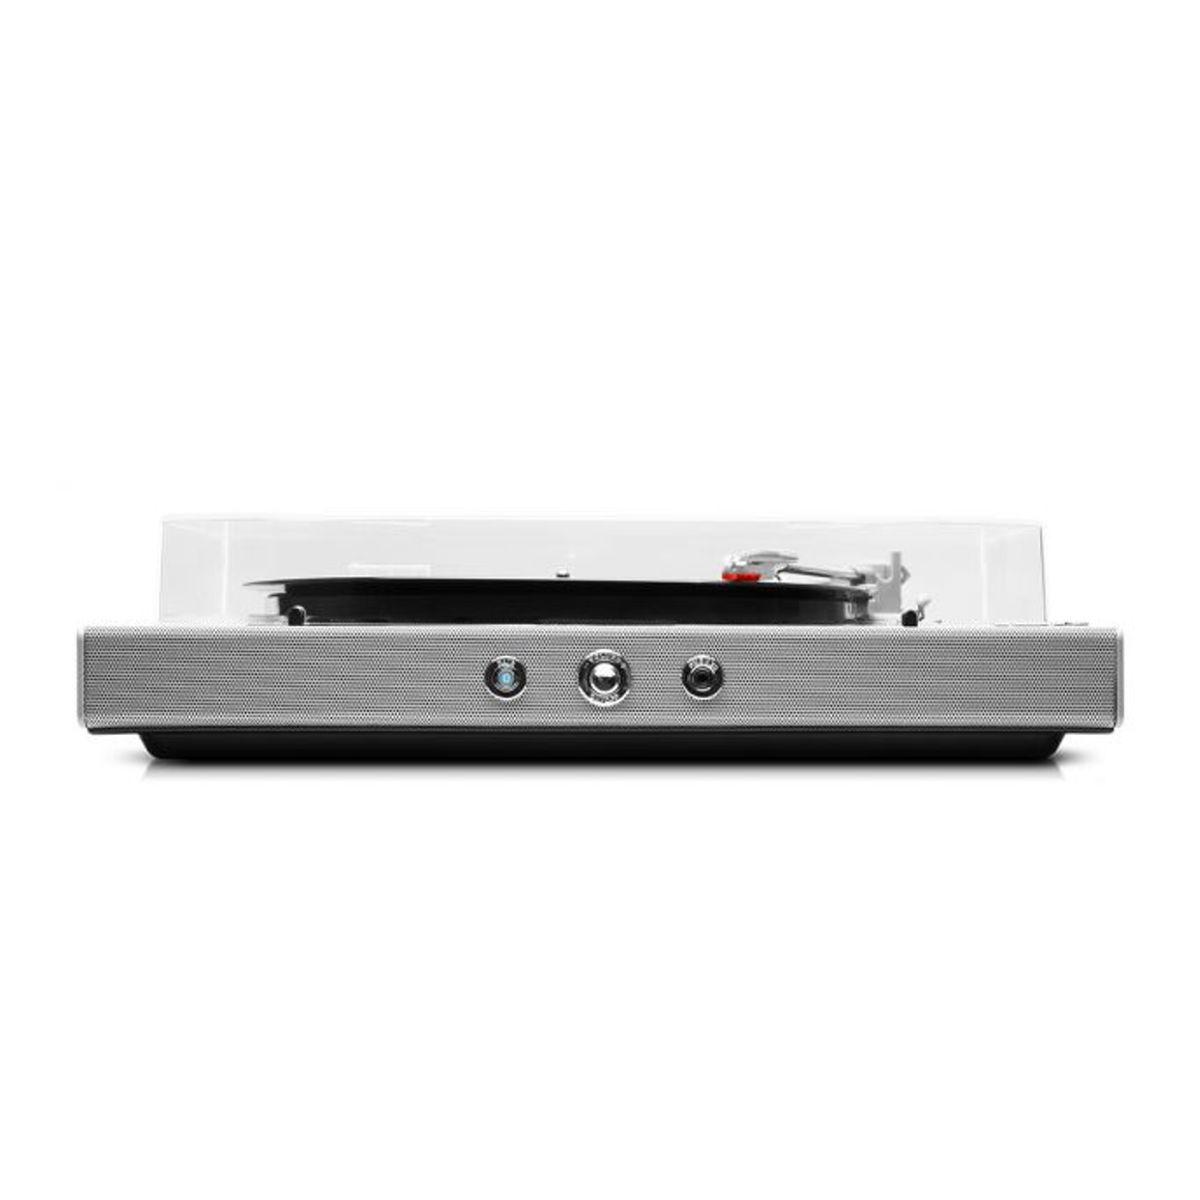 Toca Discos C/ Conversor Digital de Vinil / Alto Falante Integrado Premier LP ION